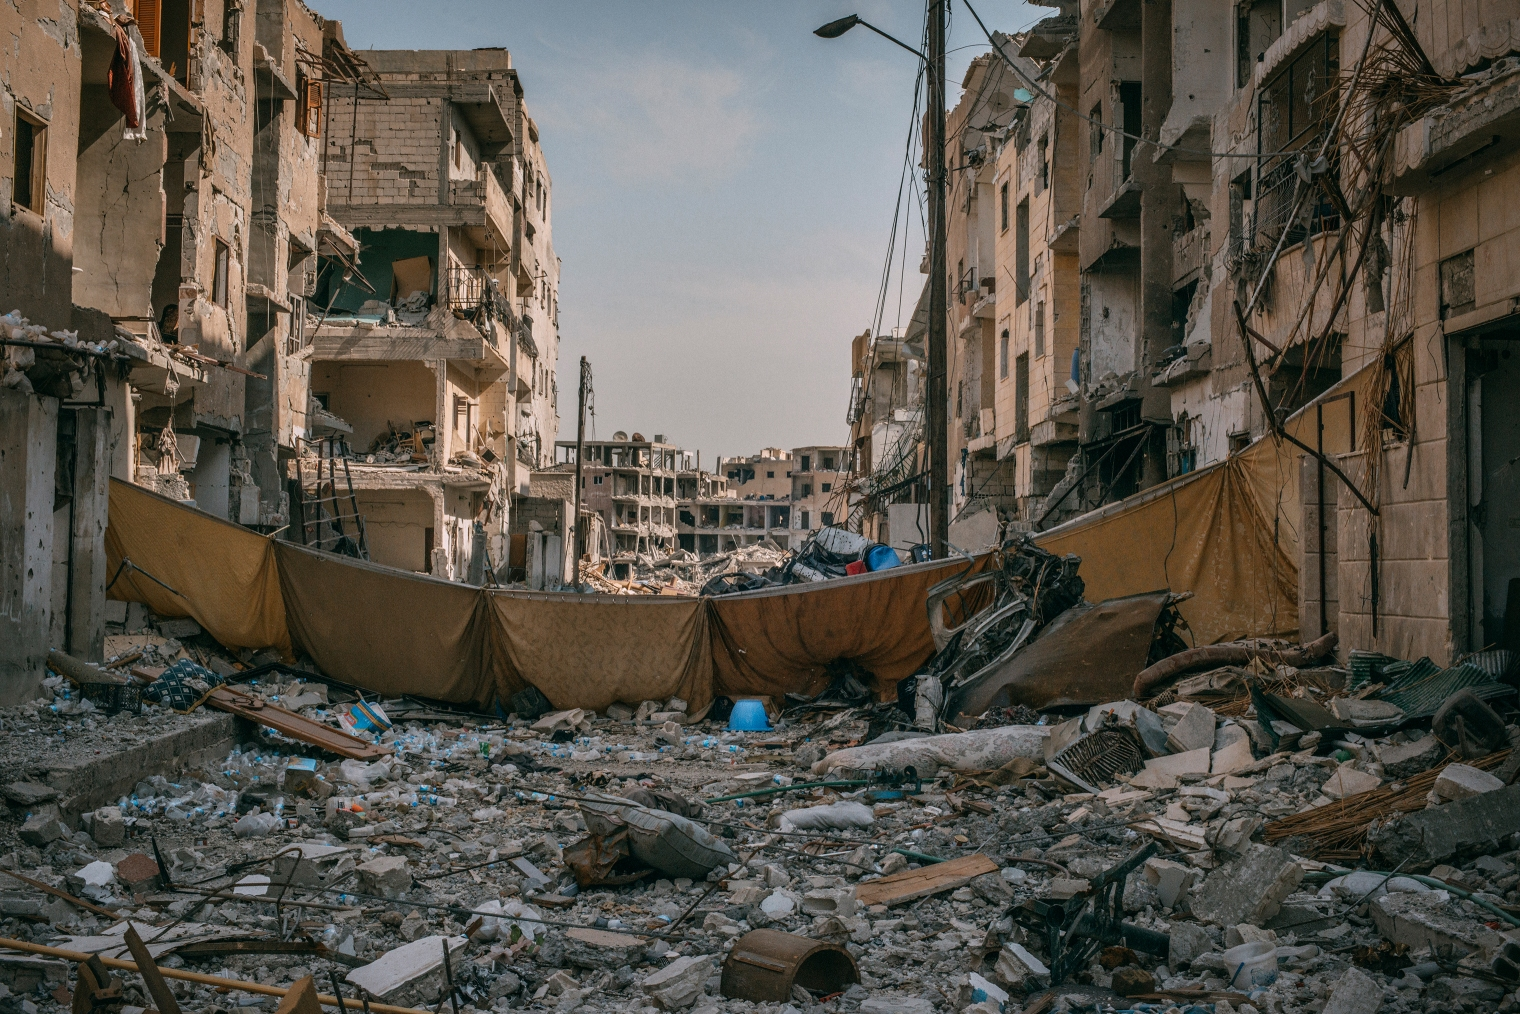 emanuele-satolli-raqqa-syria-reconstruction-chemistry-street